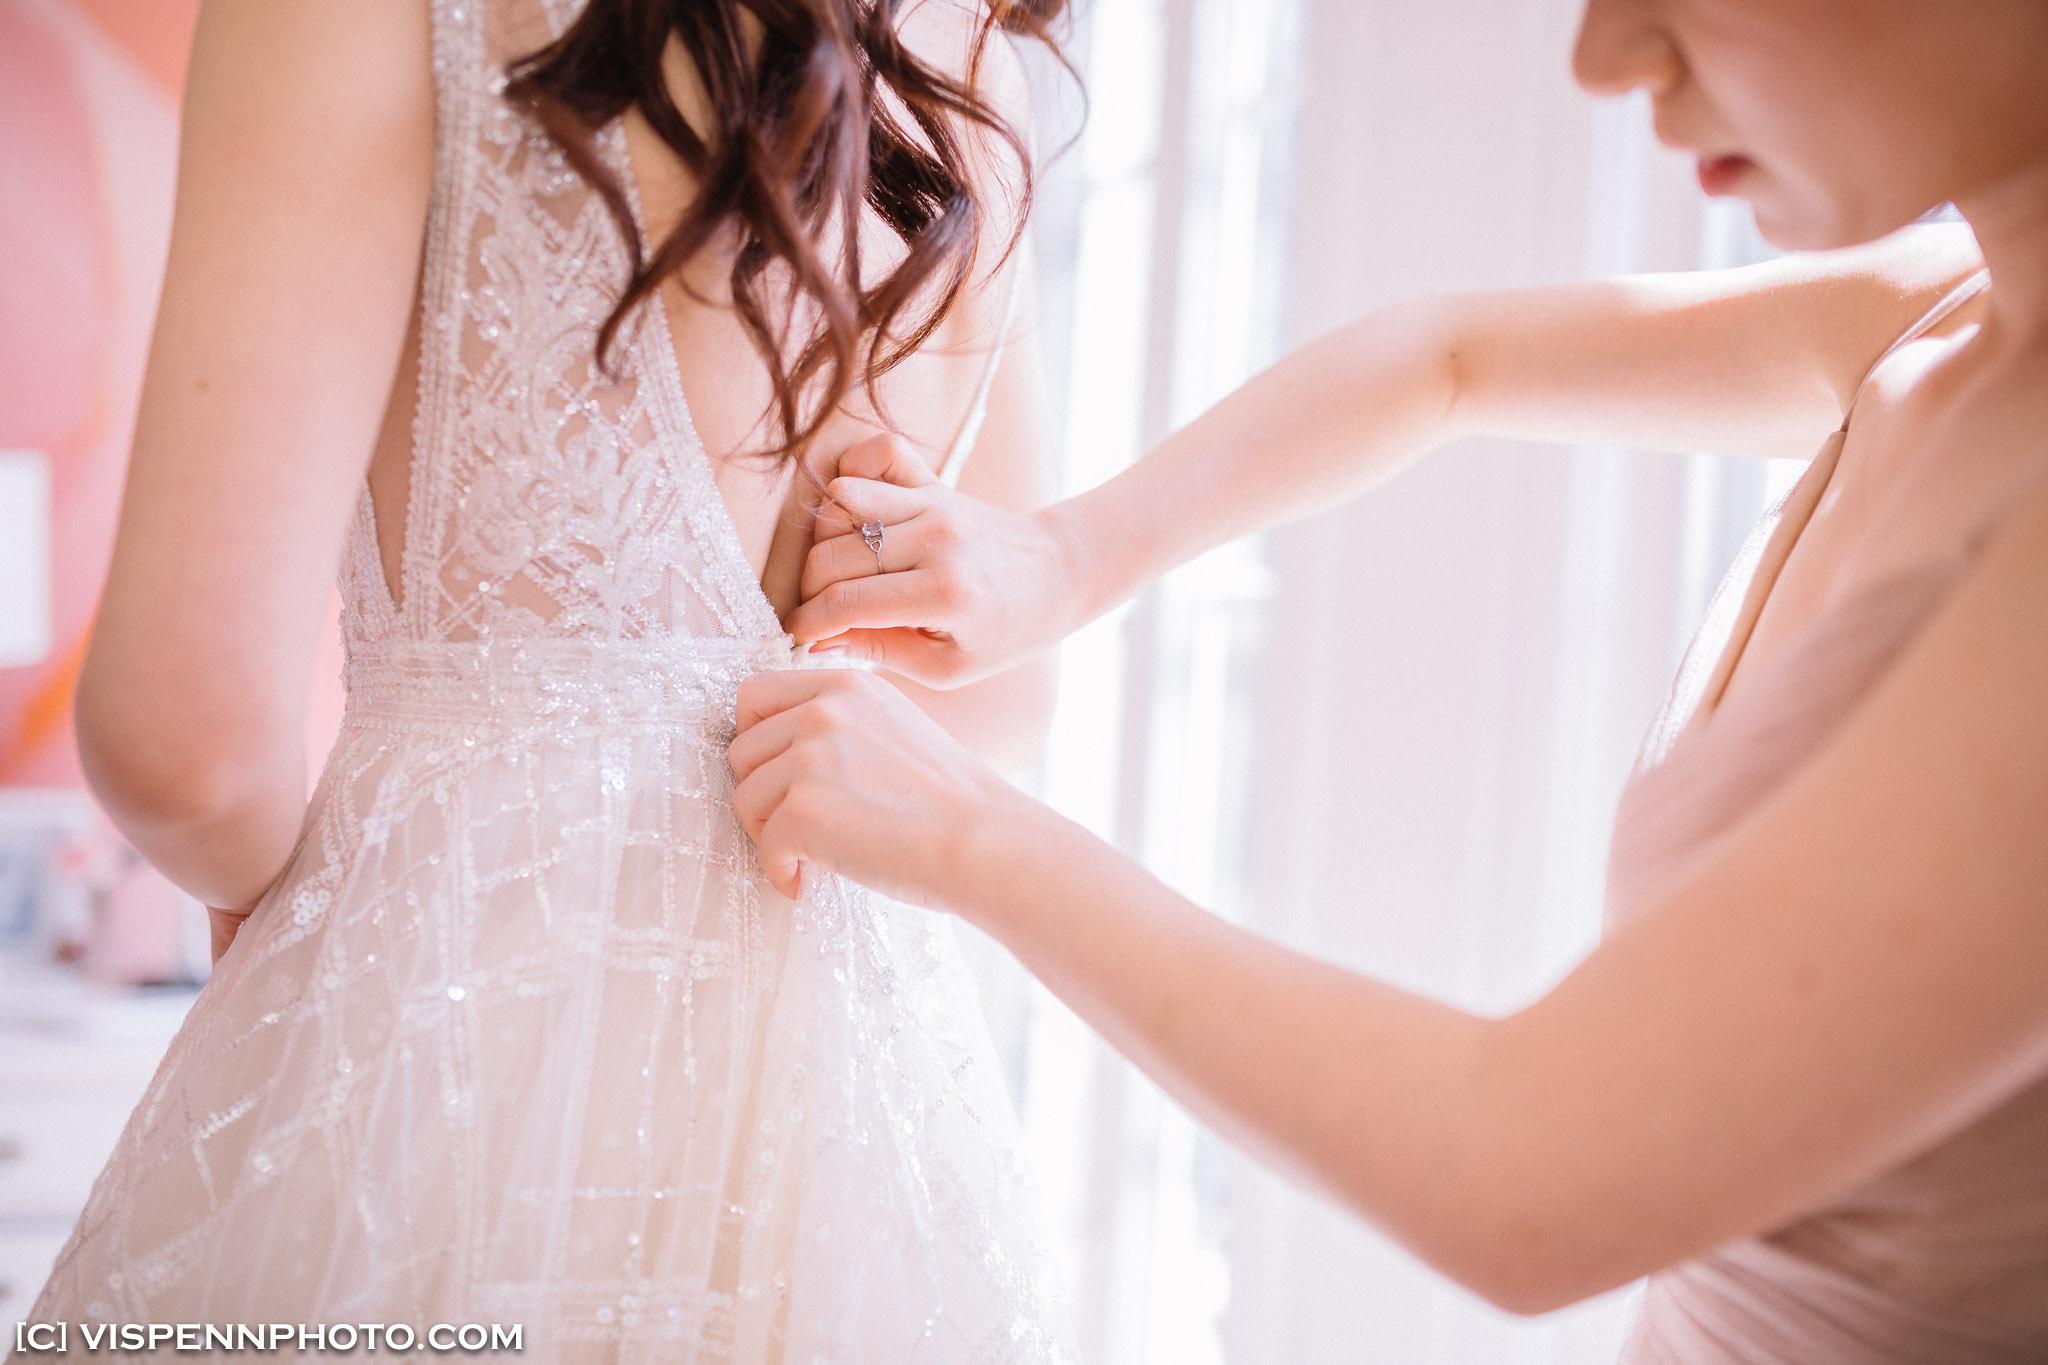 WEDDING DAY Photography Melbourne VISPENN 墨尔本 婚礼跟拍 婚礼摄像 婚礼摄影 结婚照 登记照 VISPENN 0044 5D4 1511